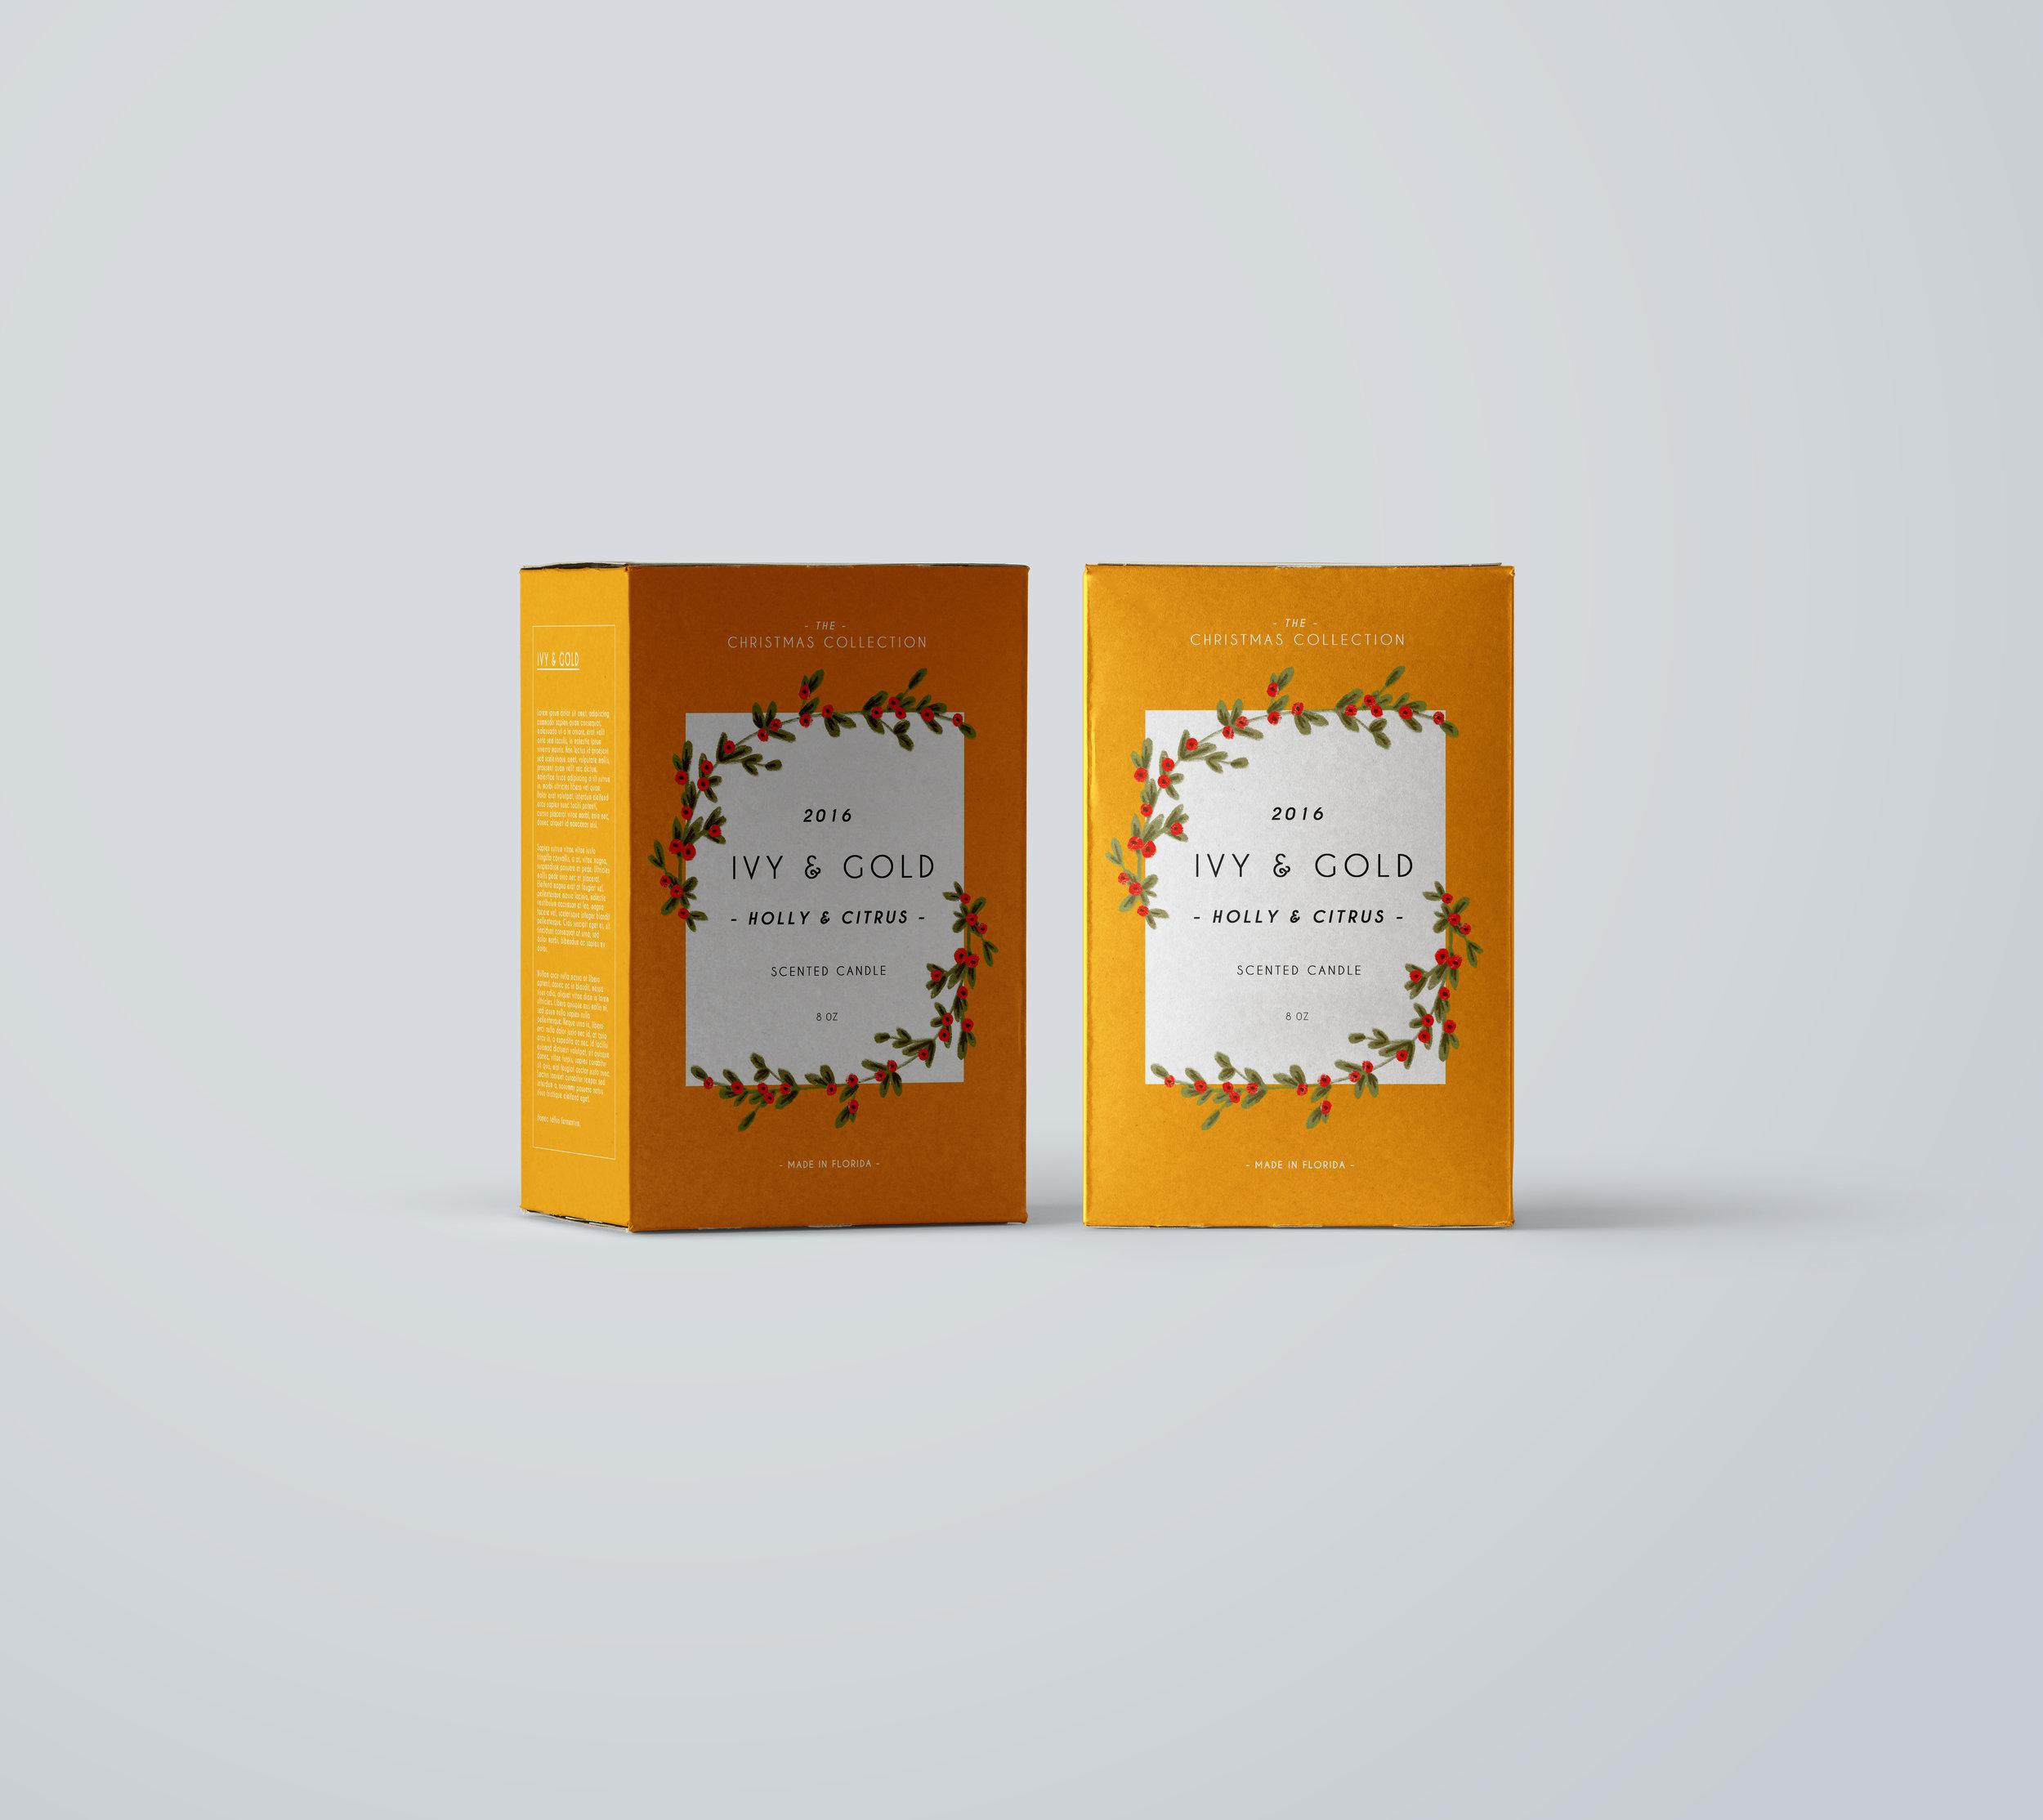 ivy & gold